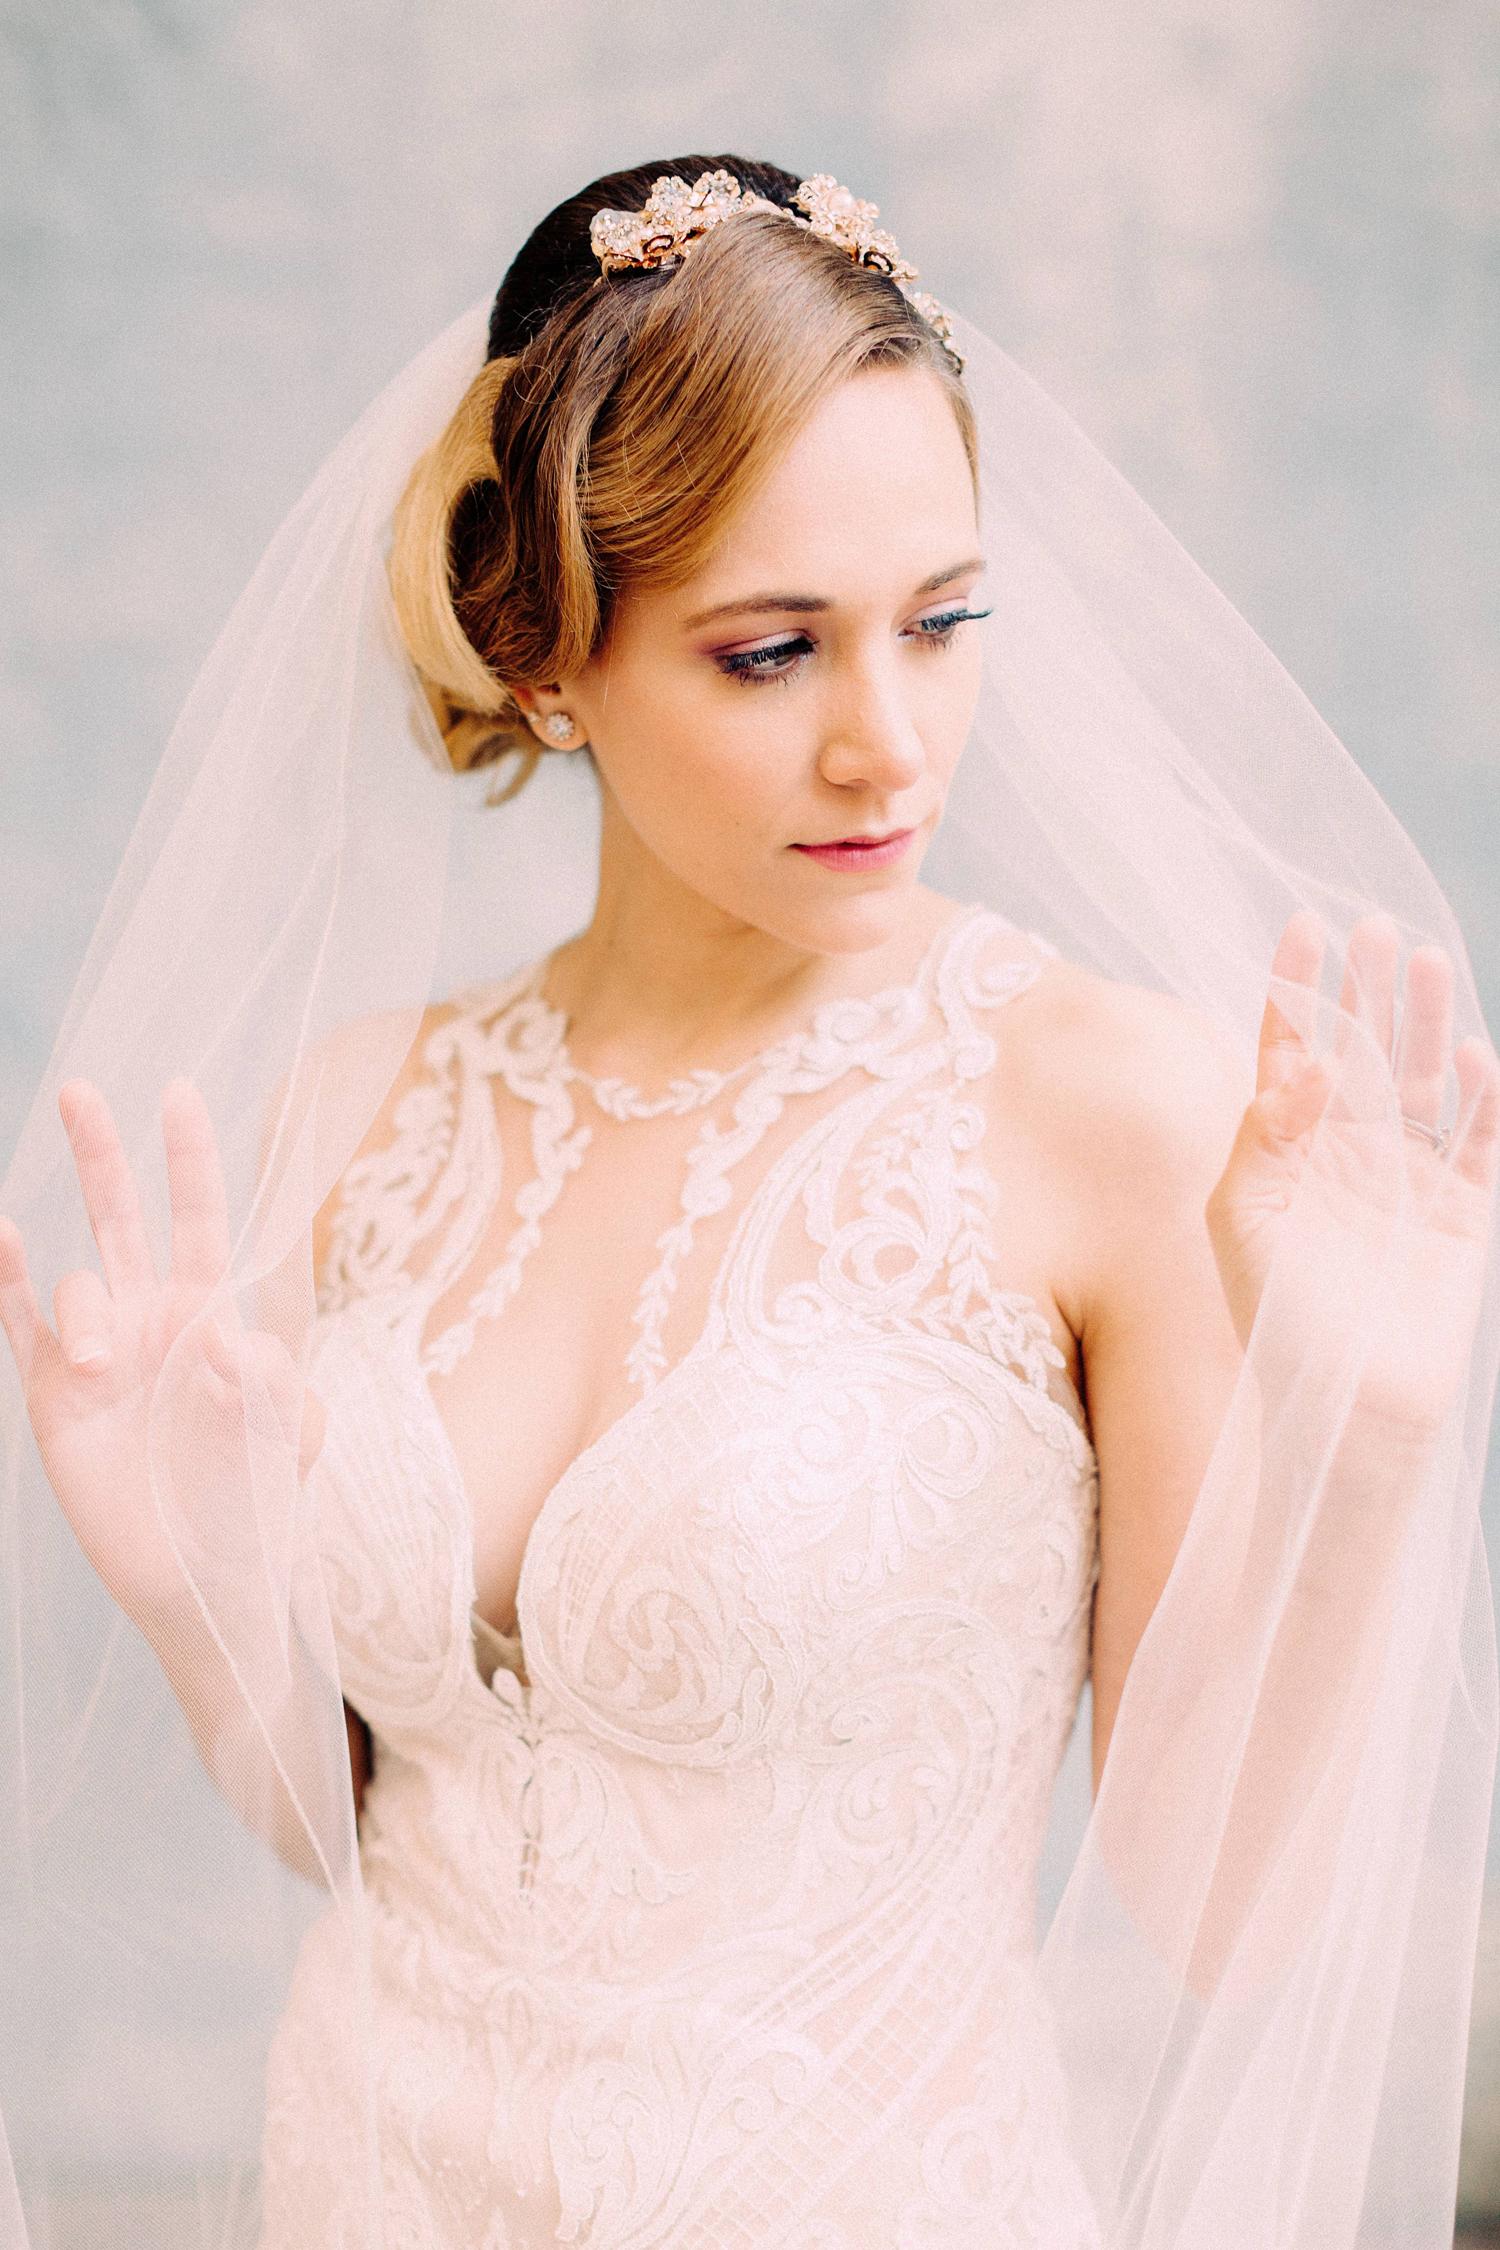 023-alaamarzouk-alaamarzoukphotography-mcallenweddingphotographer-alaa-marzouk-mcallen-mission-wedding-texas-venue-photography-wedding-california-bride-bridal-engagement-austin-elopement.jpg